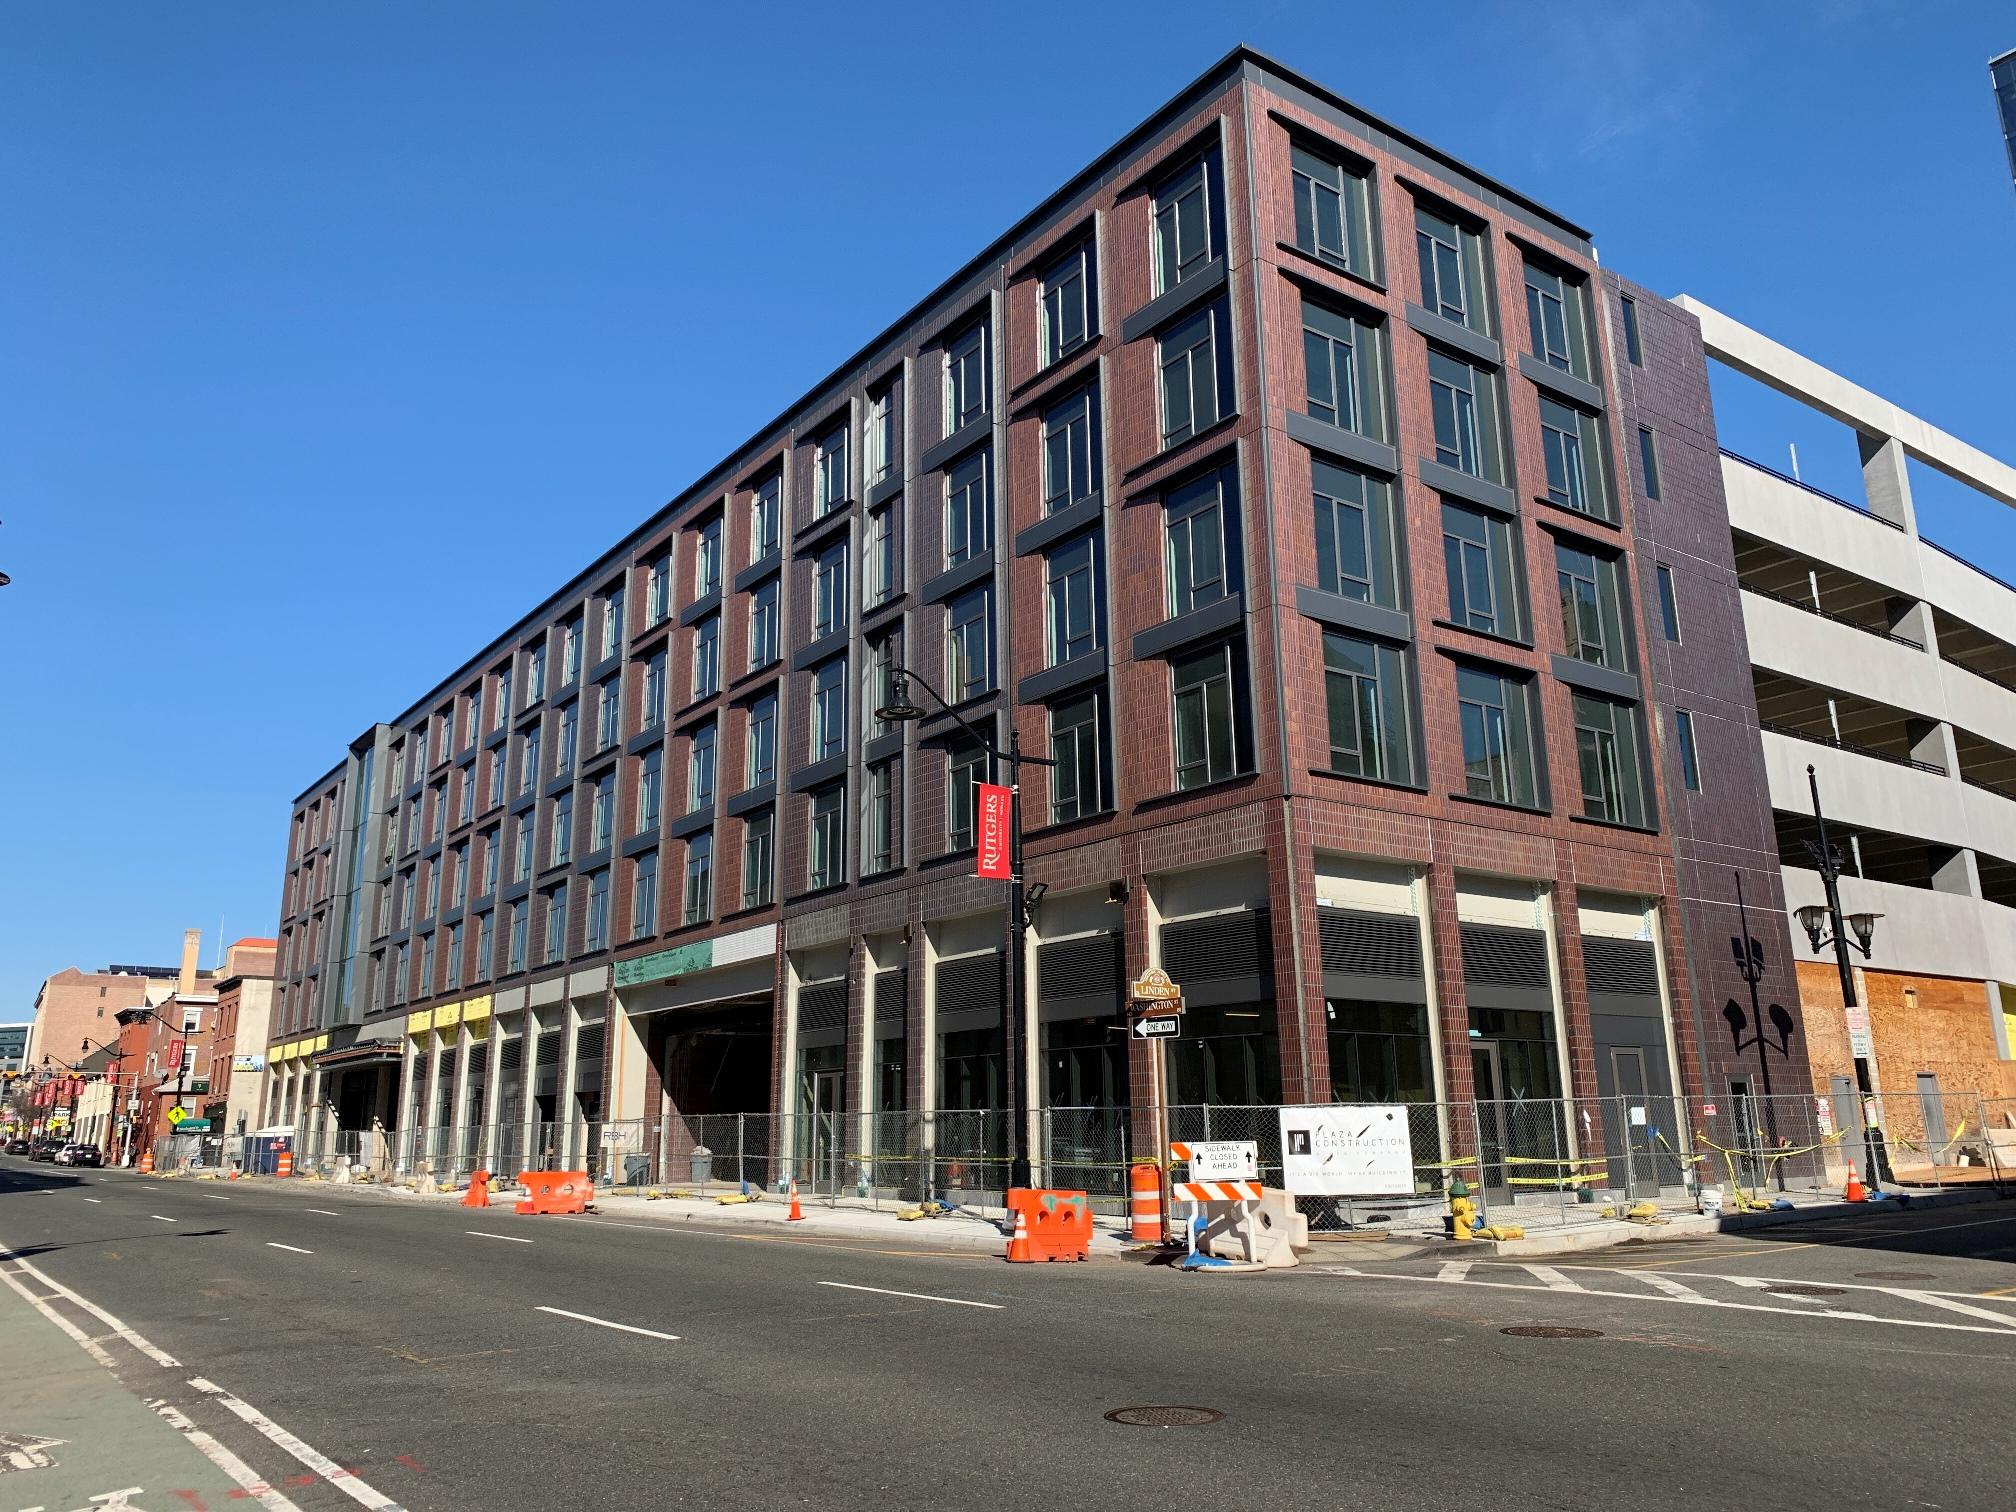 Rutgers Honors Living-Learning Community